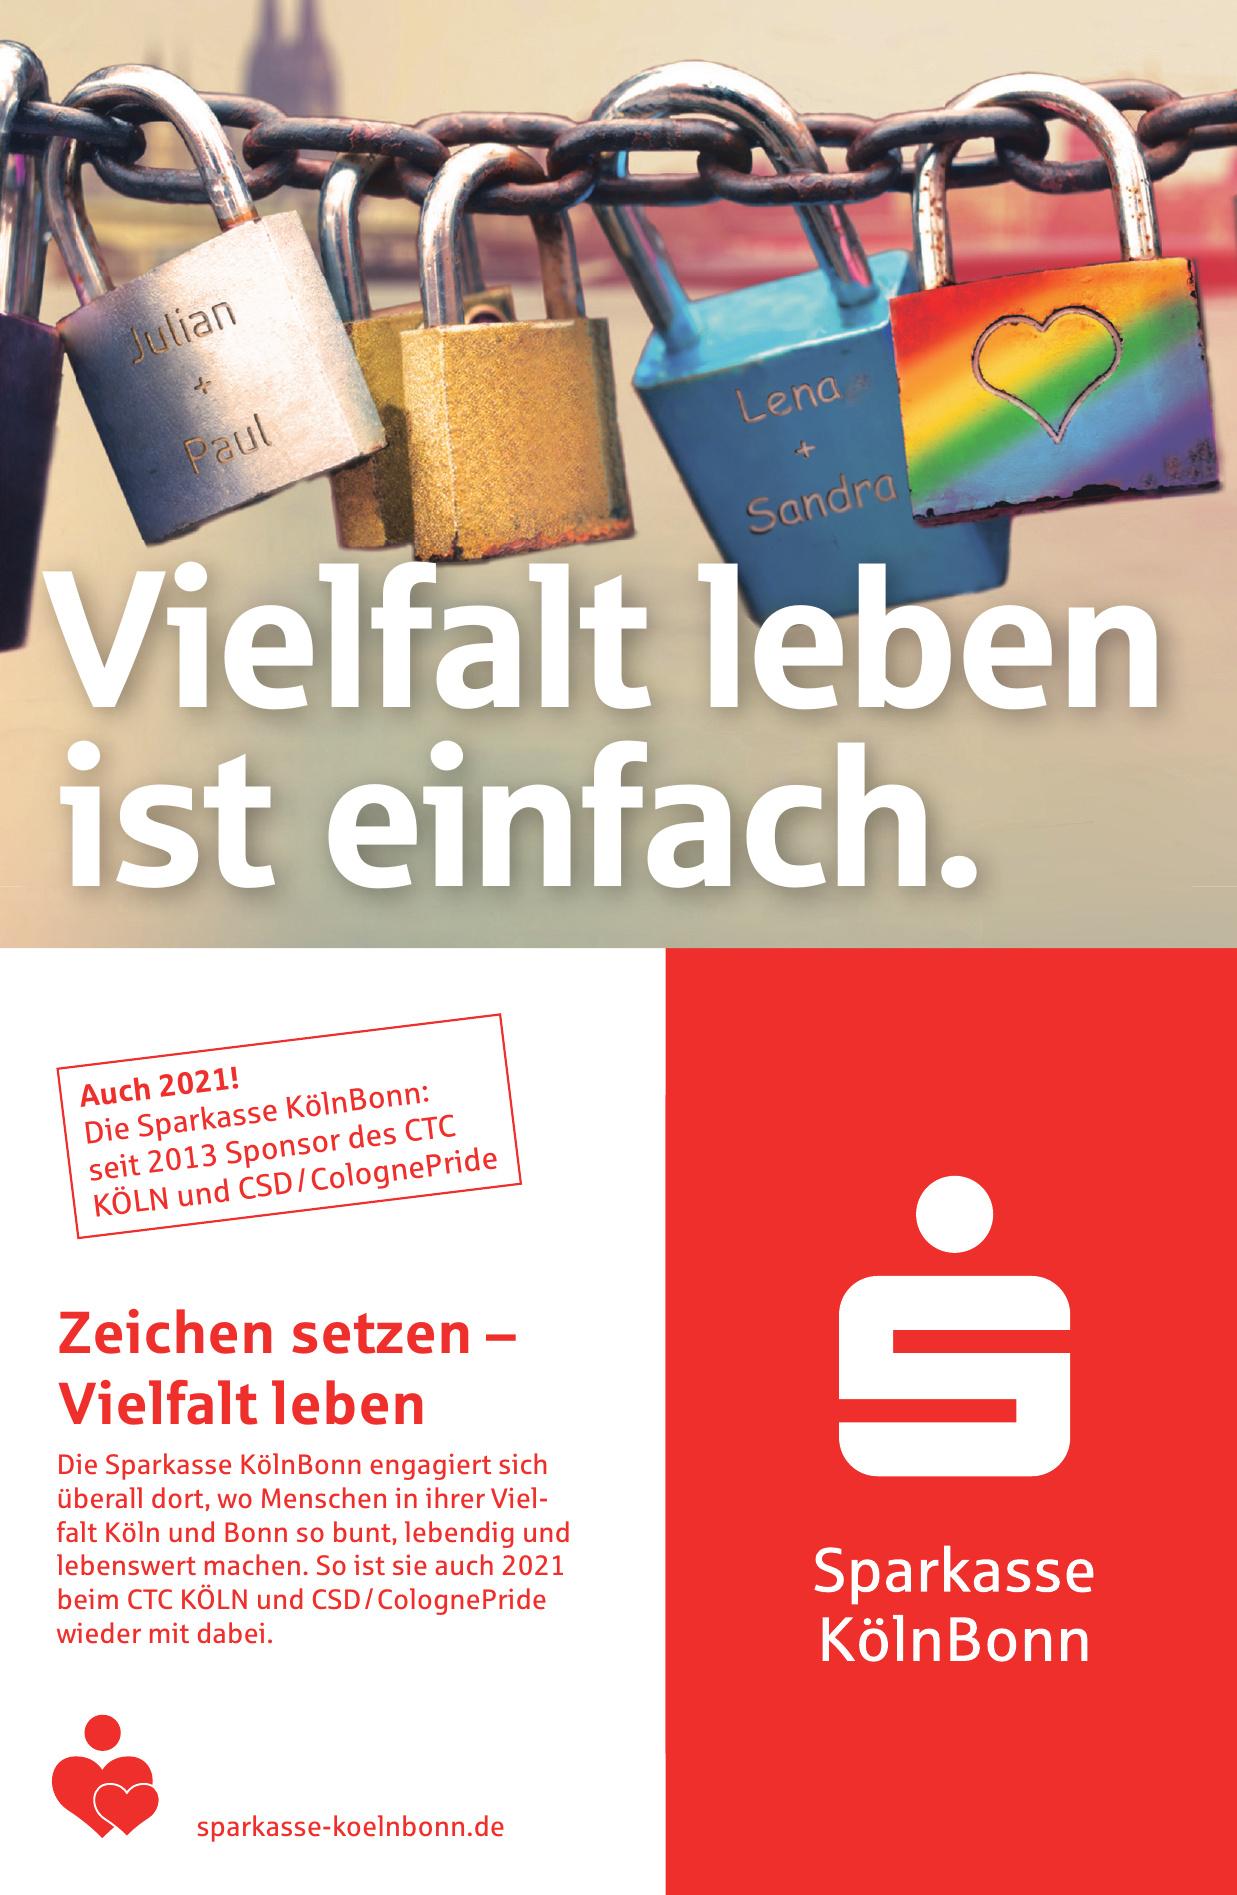 Sparkasse Köln Bonn